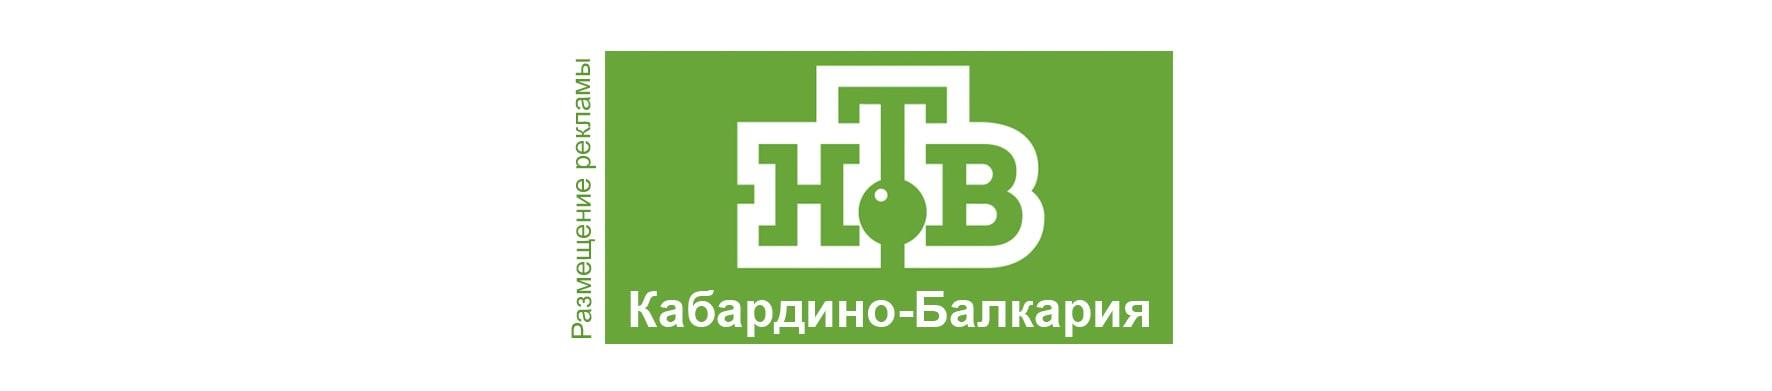 Реклама на телевидении в Кабардино-Балкарии НТВ КБР